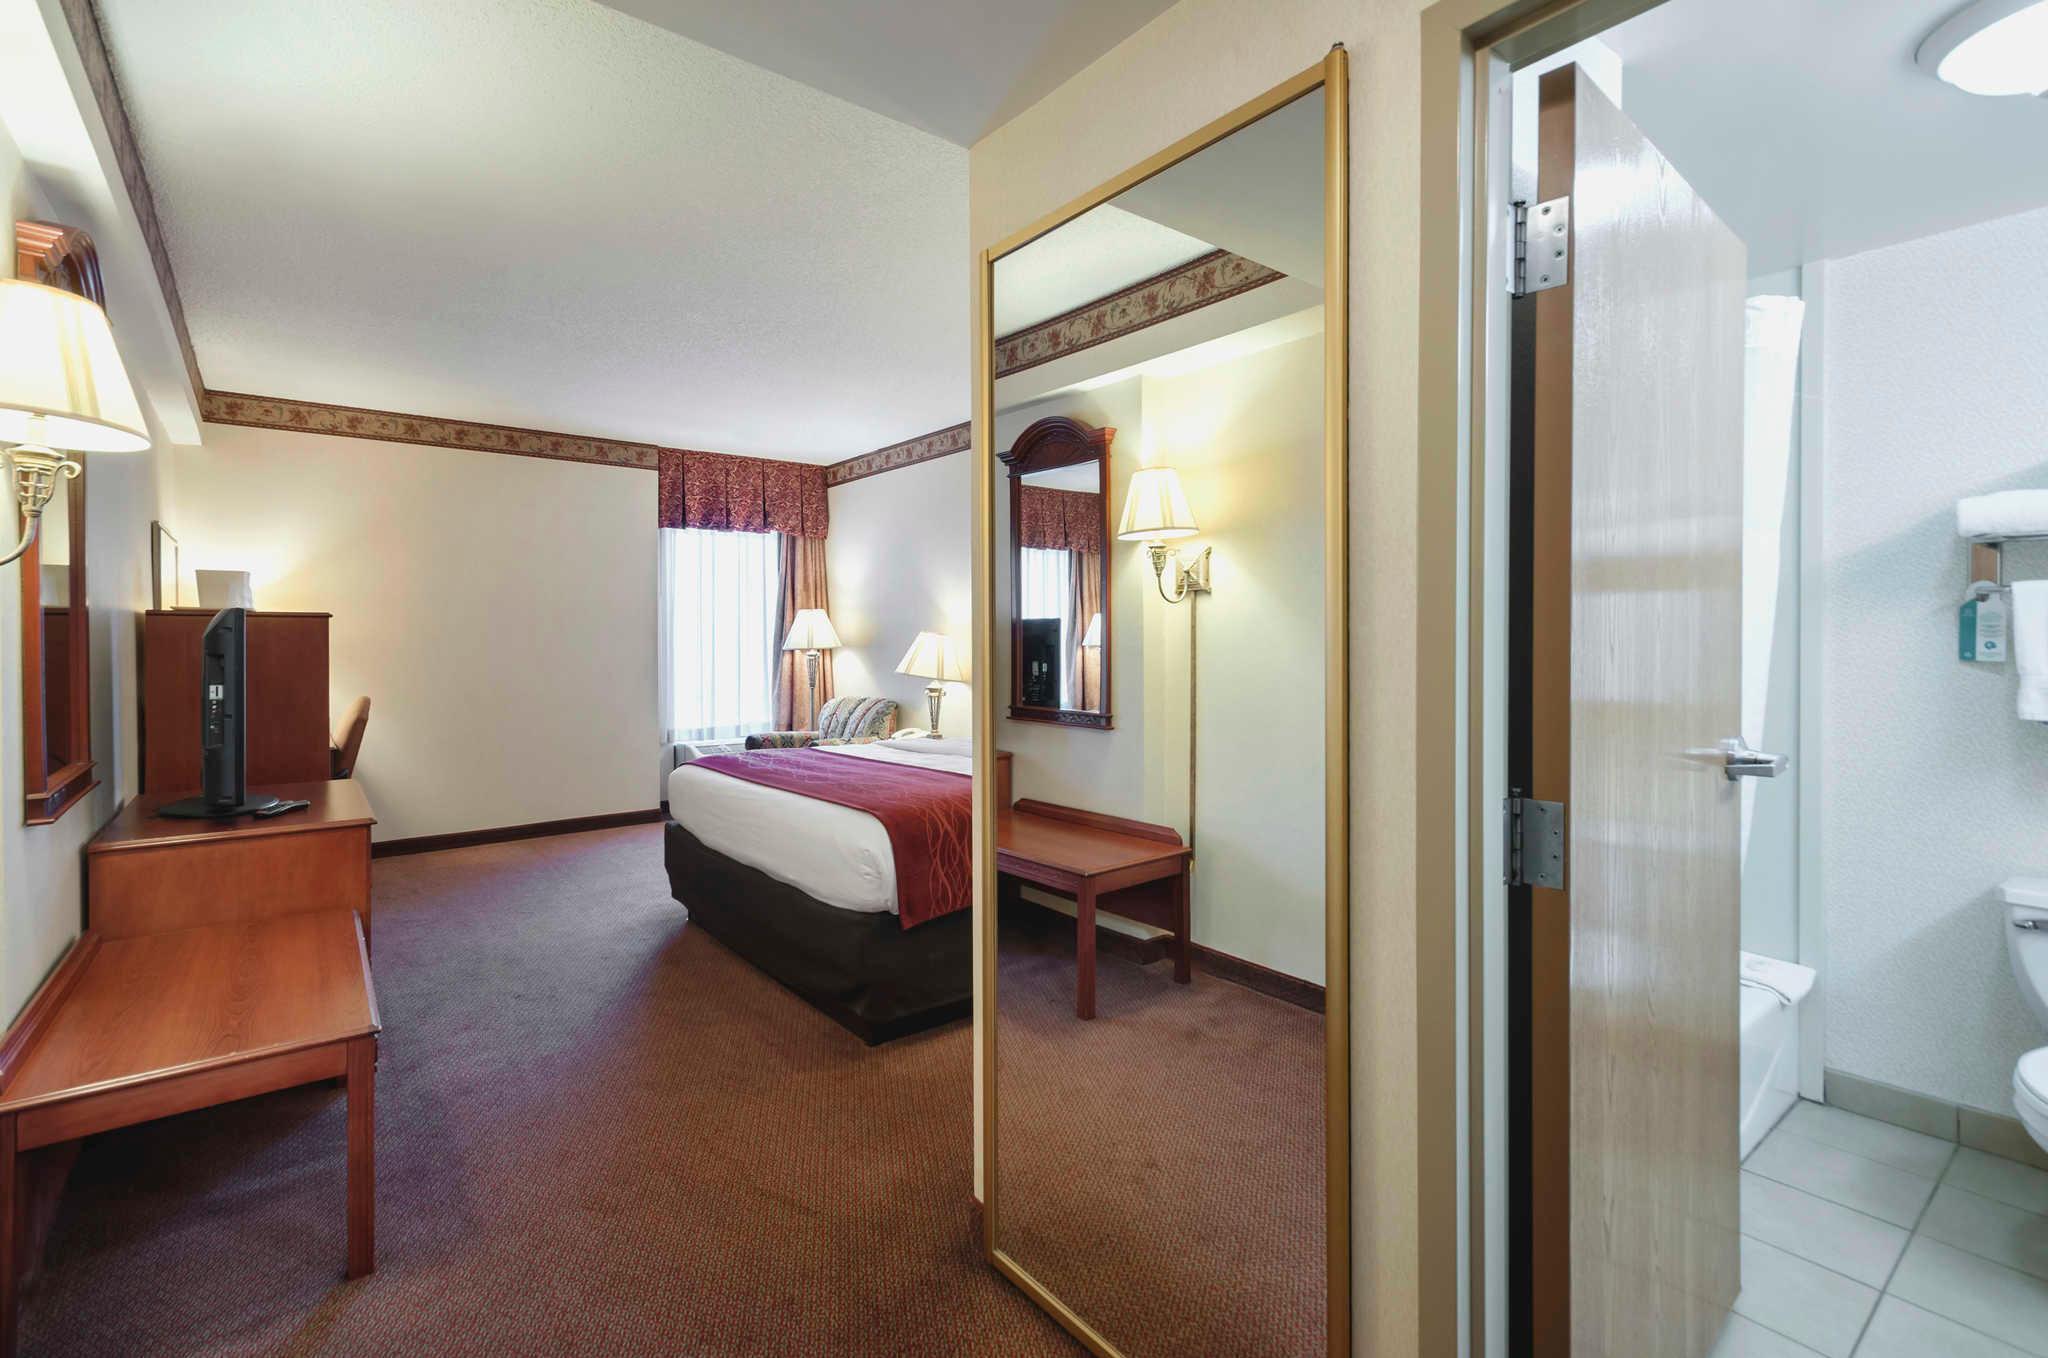 Comfort Inn & Suites Edgewood - Aberdeen image 11